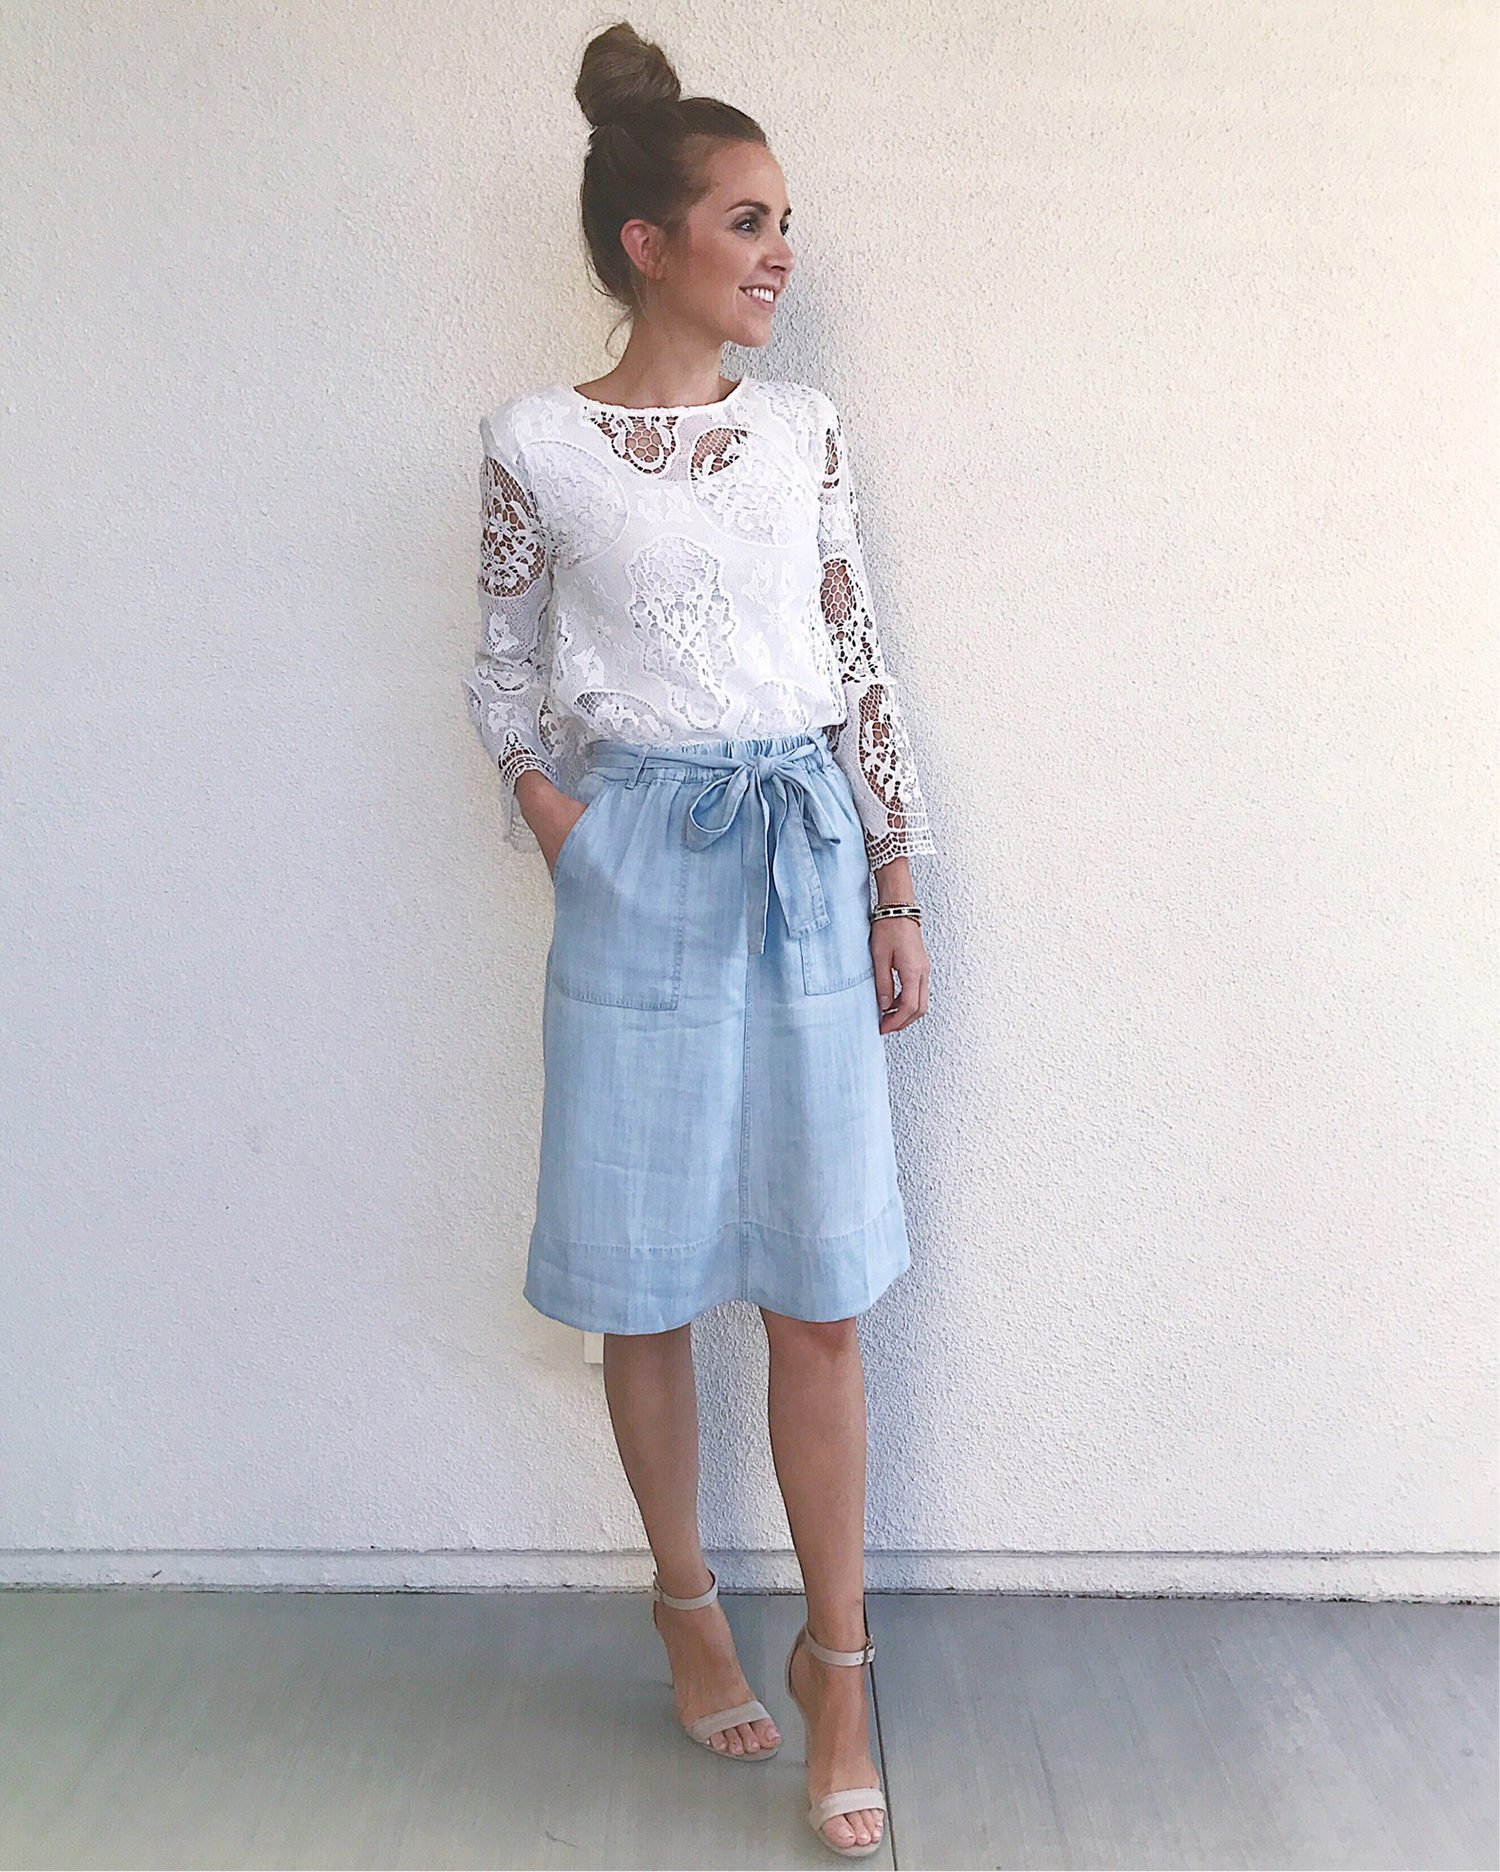 lace top and chambray skirt | merricksart.com